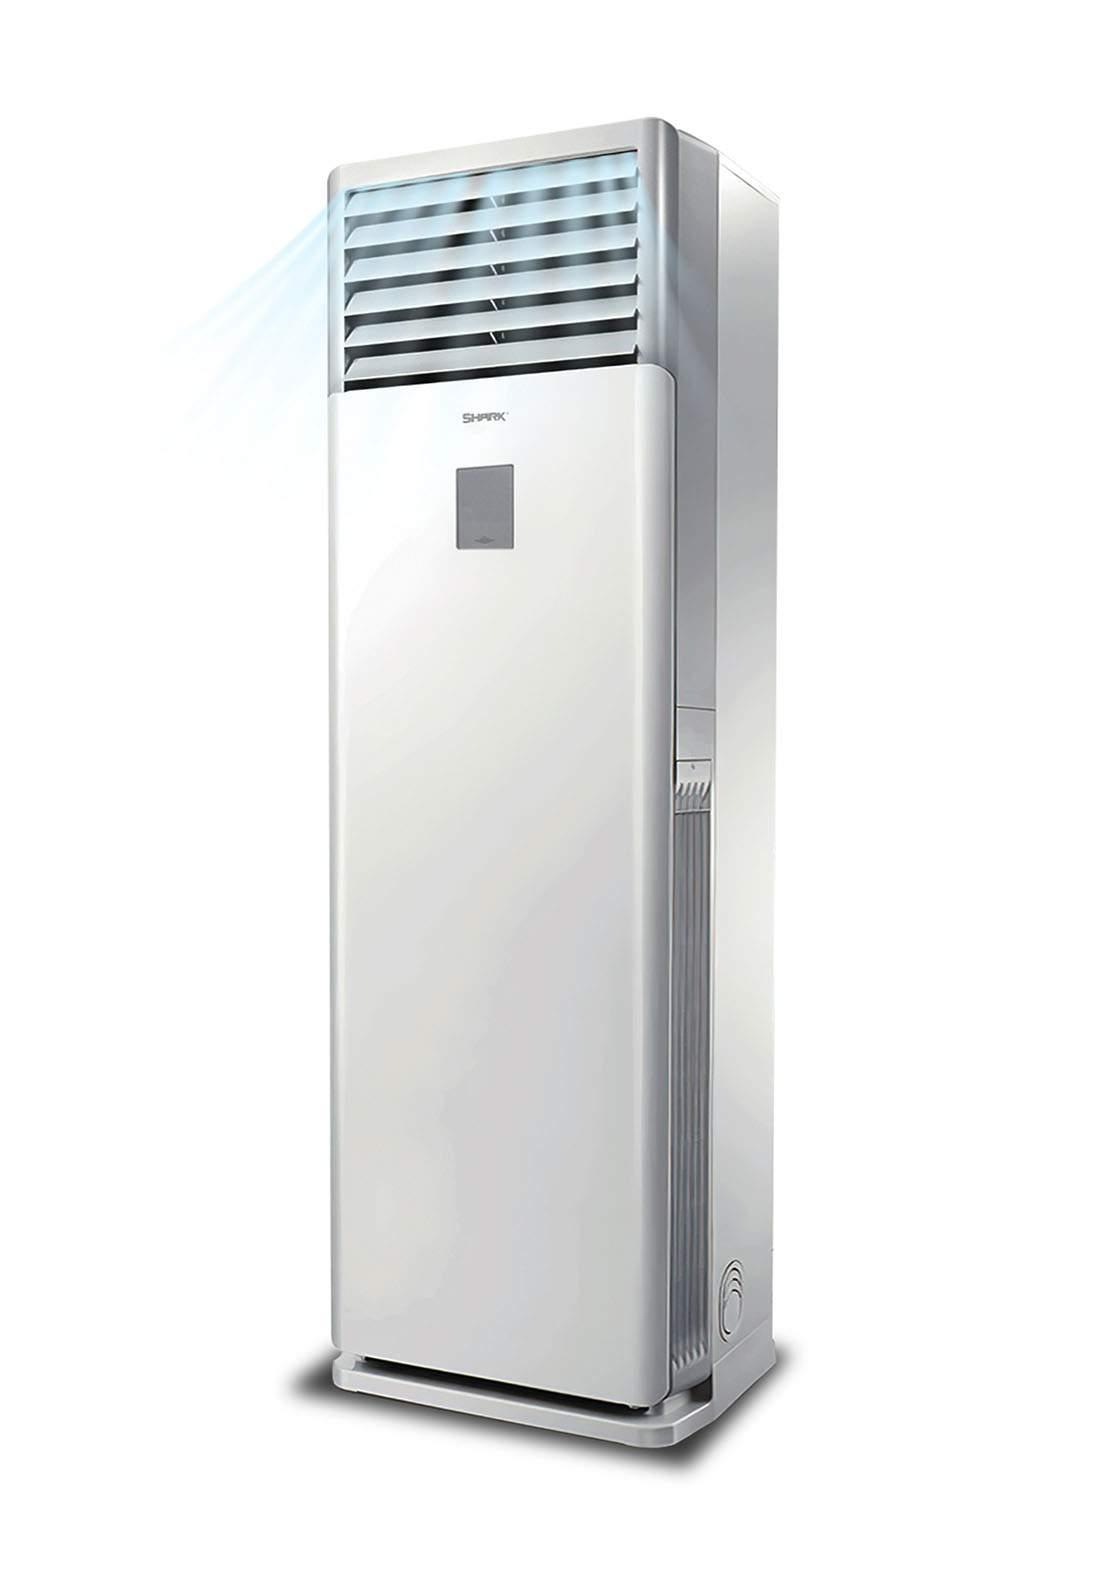 Shark Split Vertical Air Conditioner 3 Ton 36000 N - سبلت عمودي 3 طن